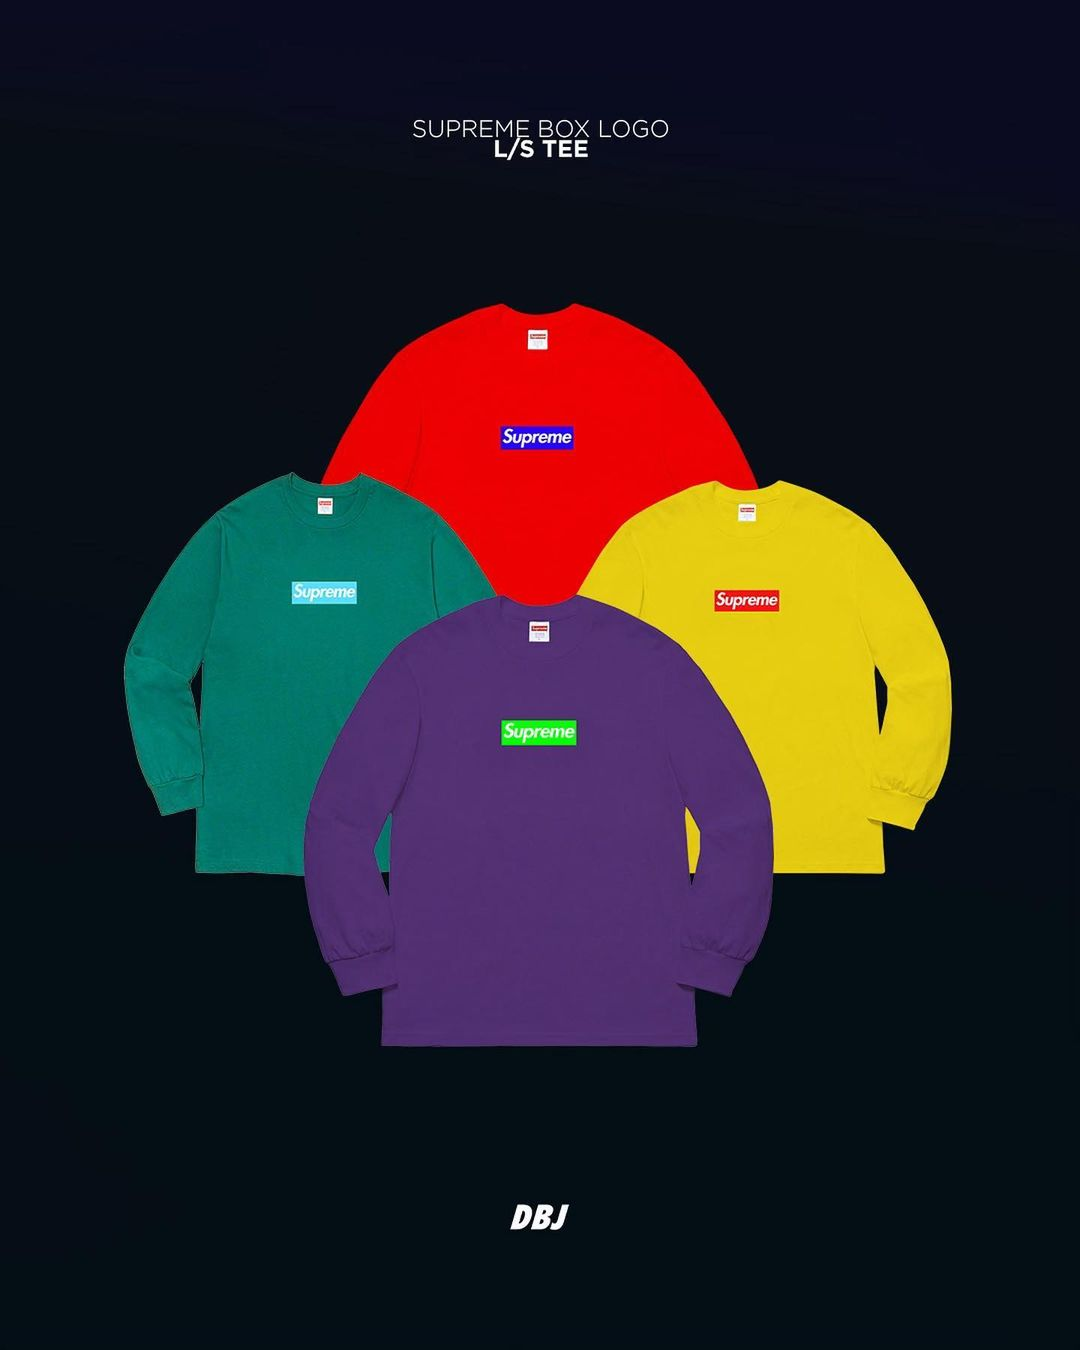 supreme-21aw-21fw-box-logo-tee-hooded-sweatshirt